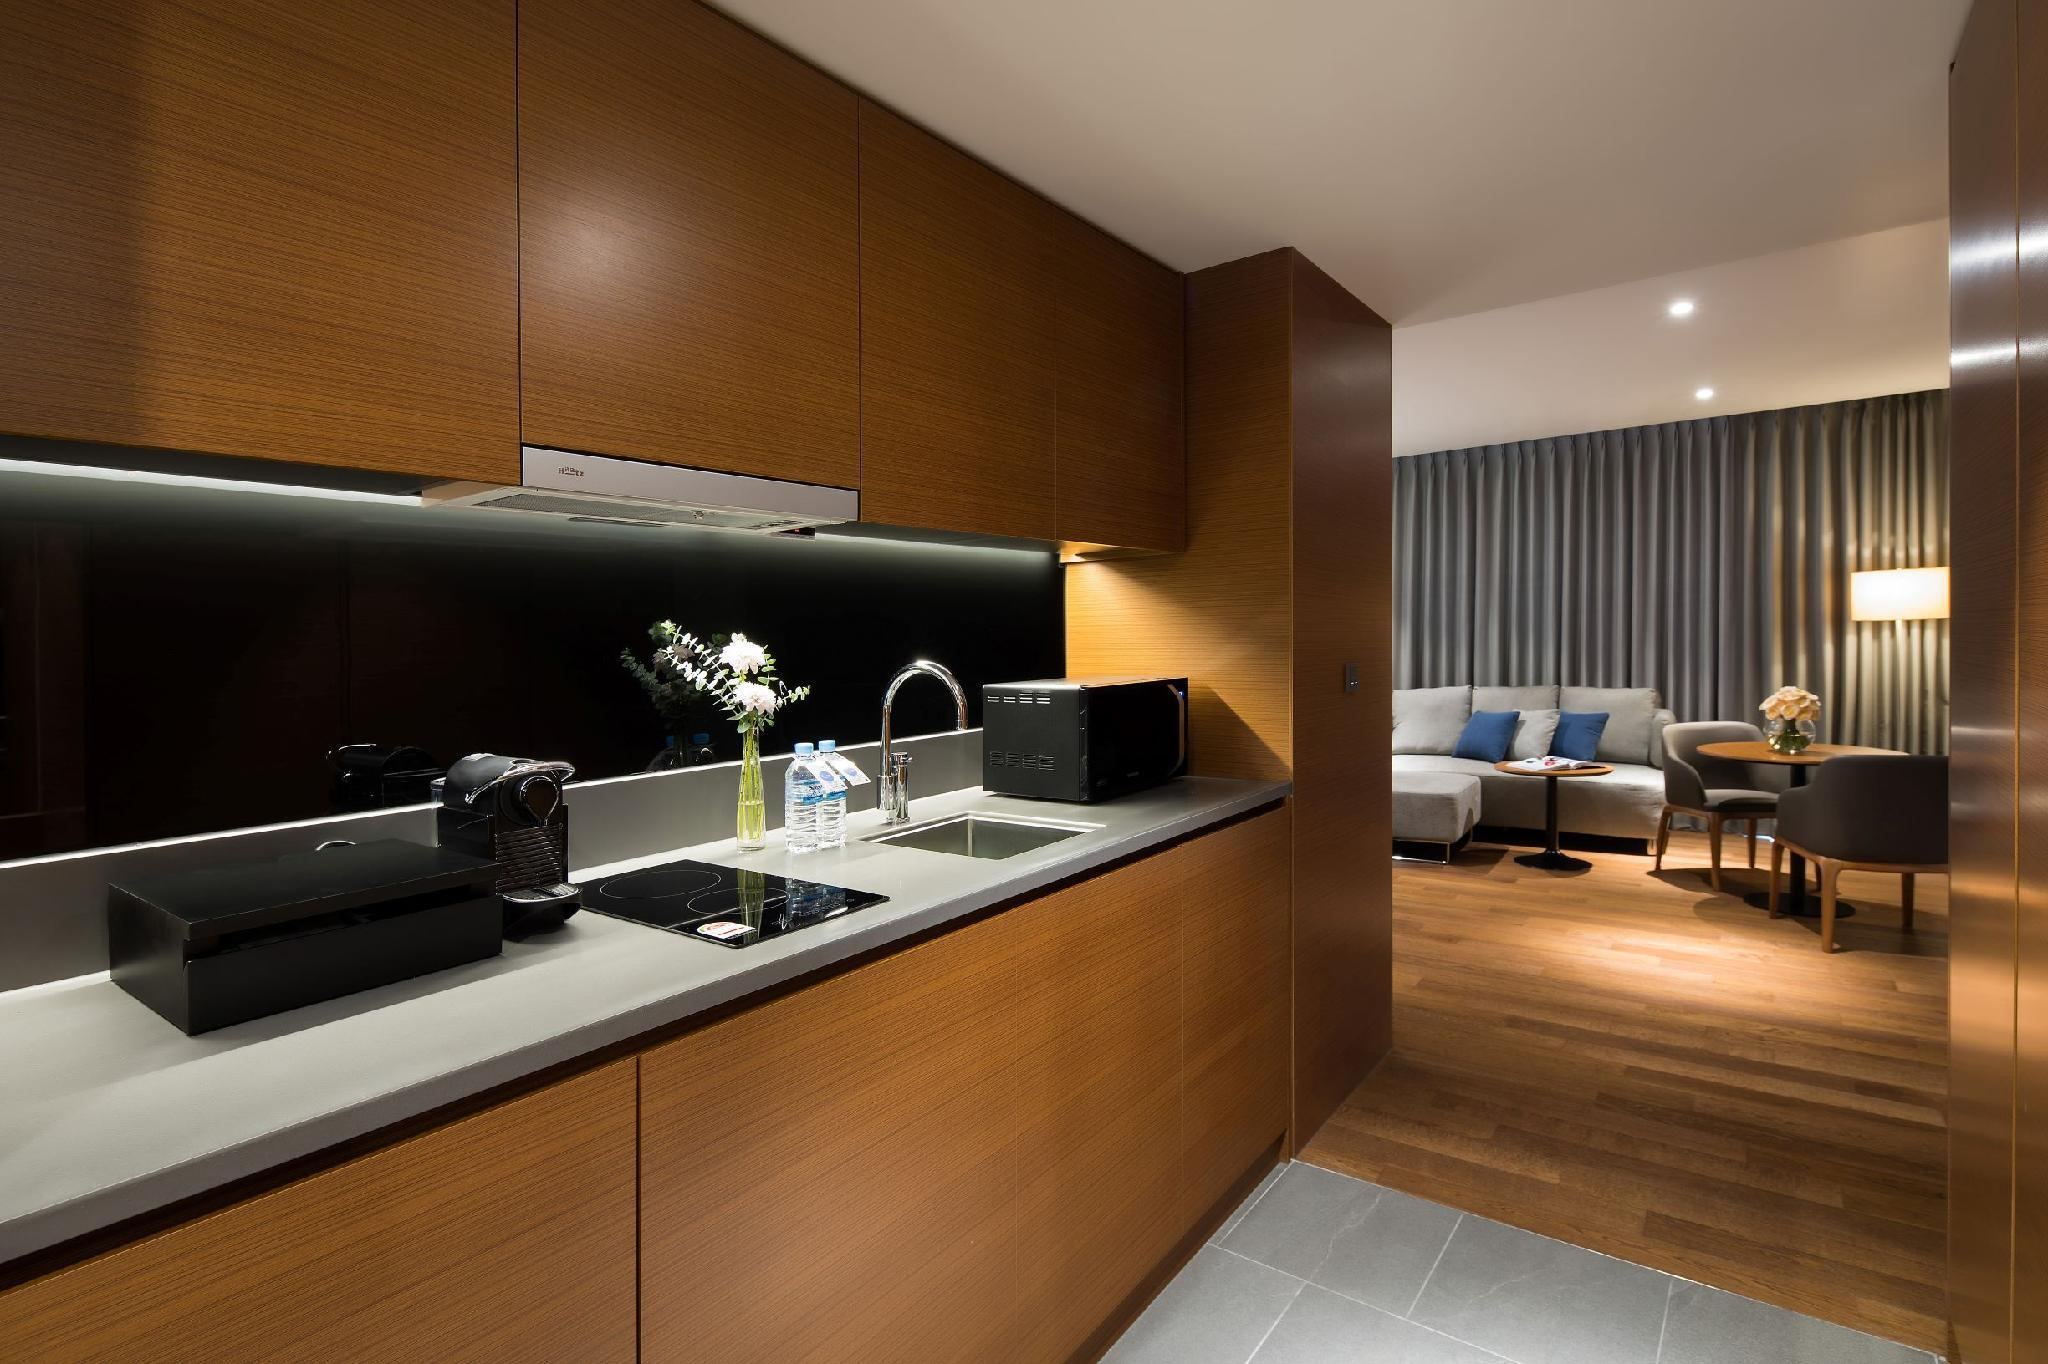 Novotel Ambassador Seoul Dongdaemun Hotels & residences Reviews